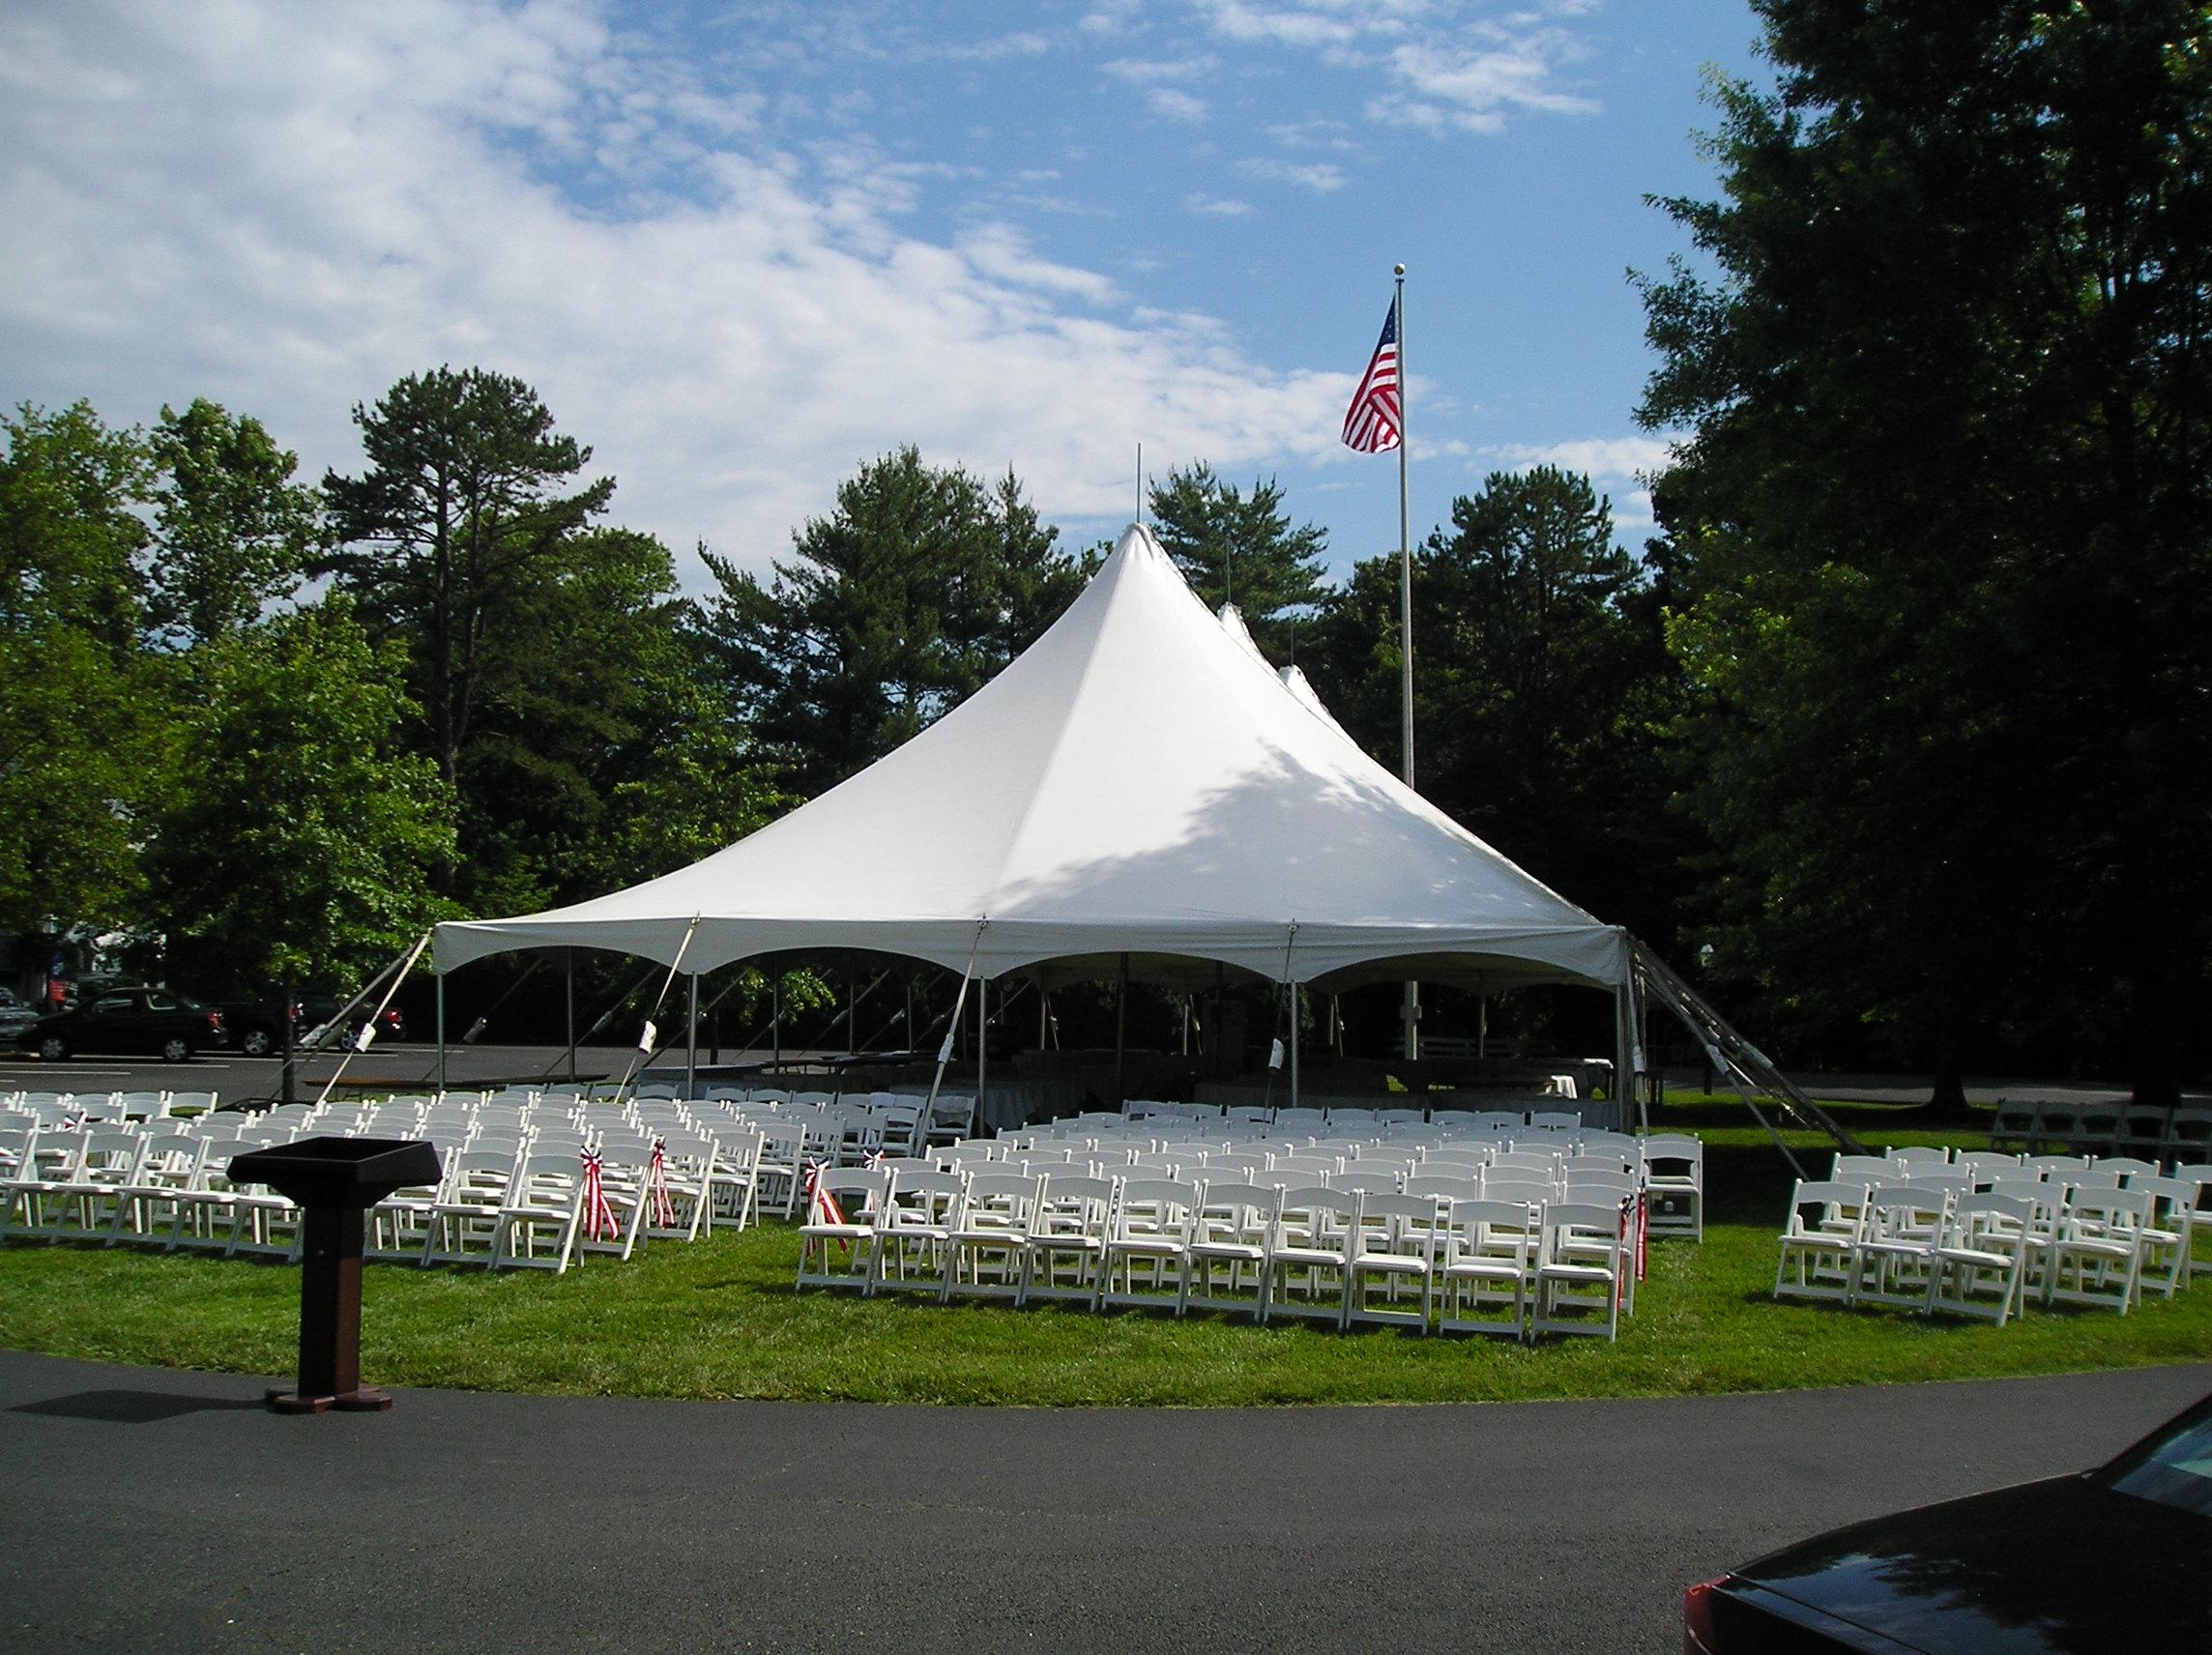 Party Rental Event Rental In Waynesboro Va Staunton Va